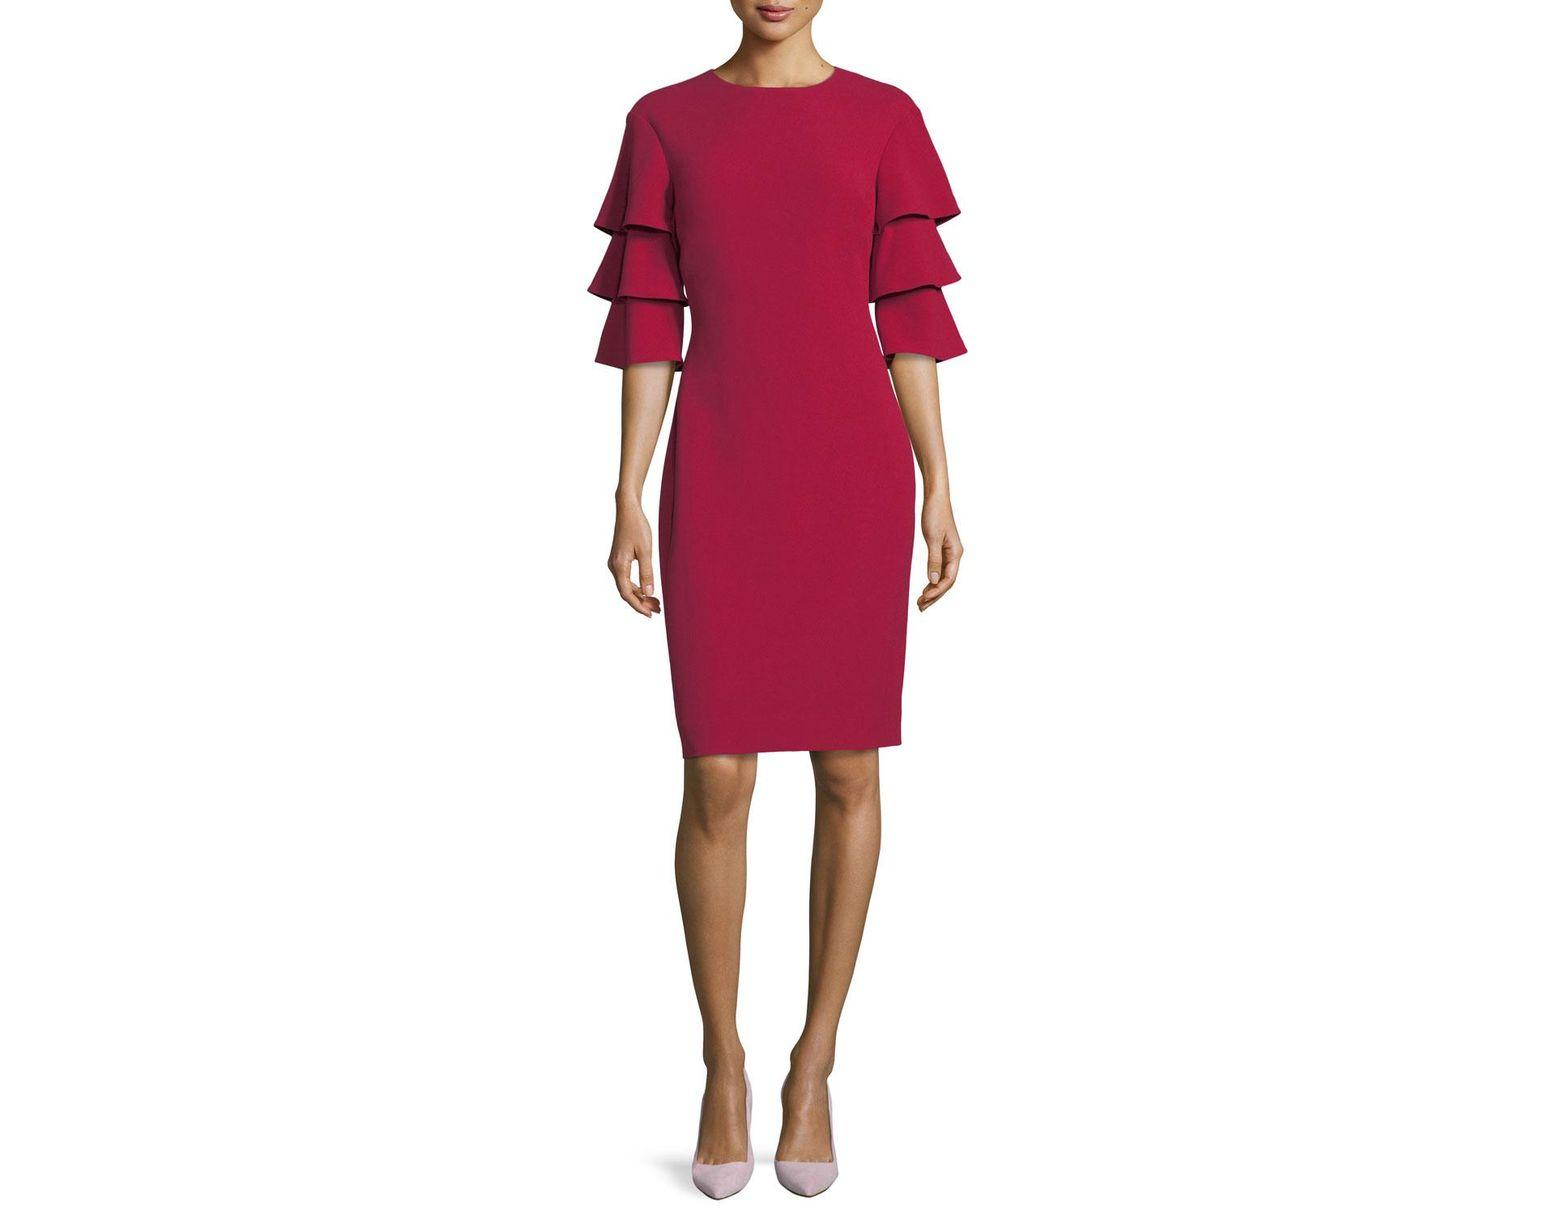 565f2b08c39e Lyst - Teri Jon 3-tier-sleeve Crepe Sheath Cocktail Dress in Red